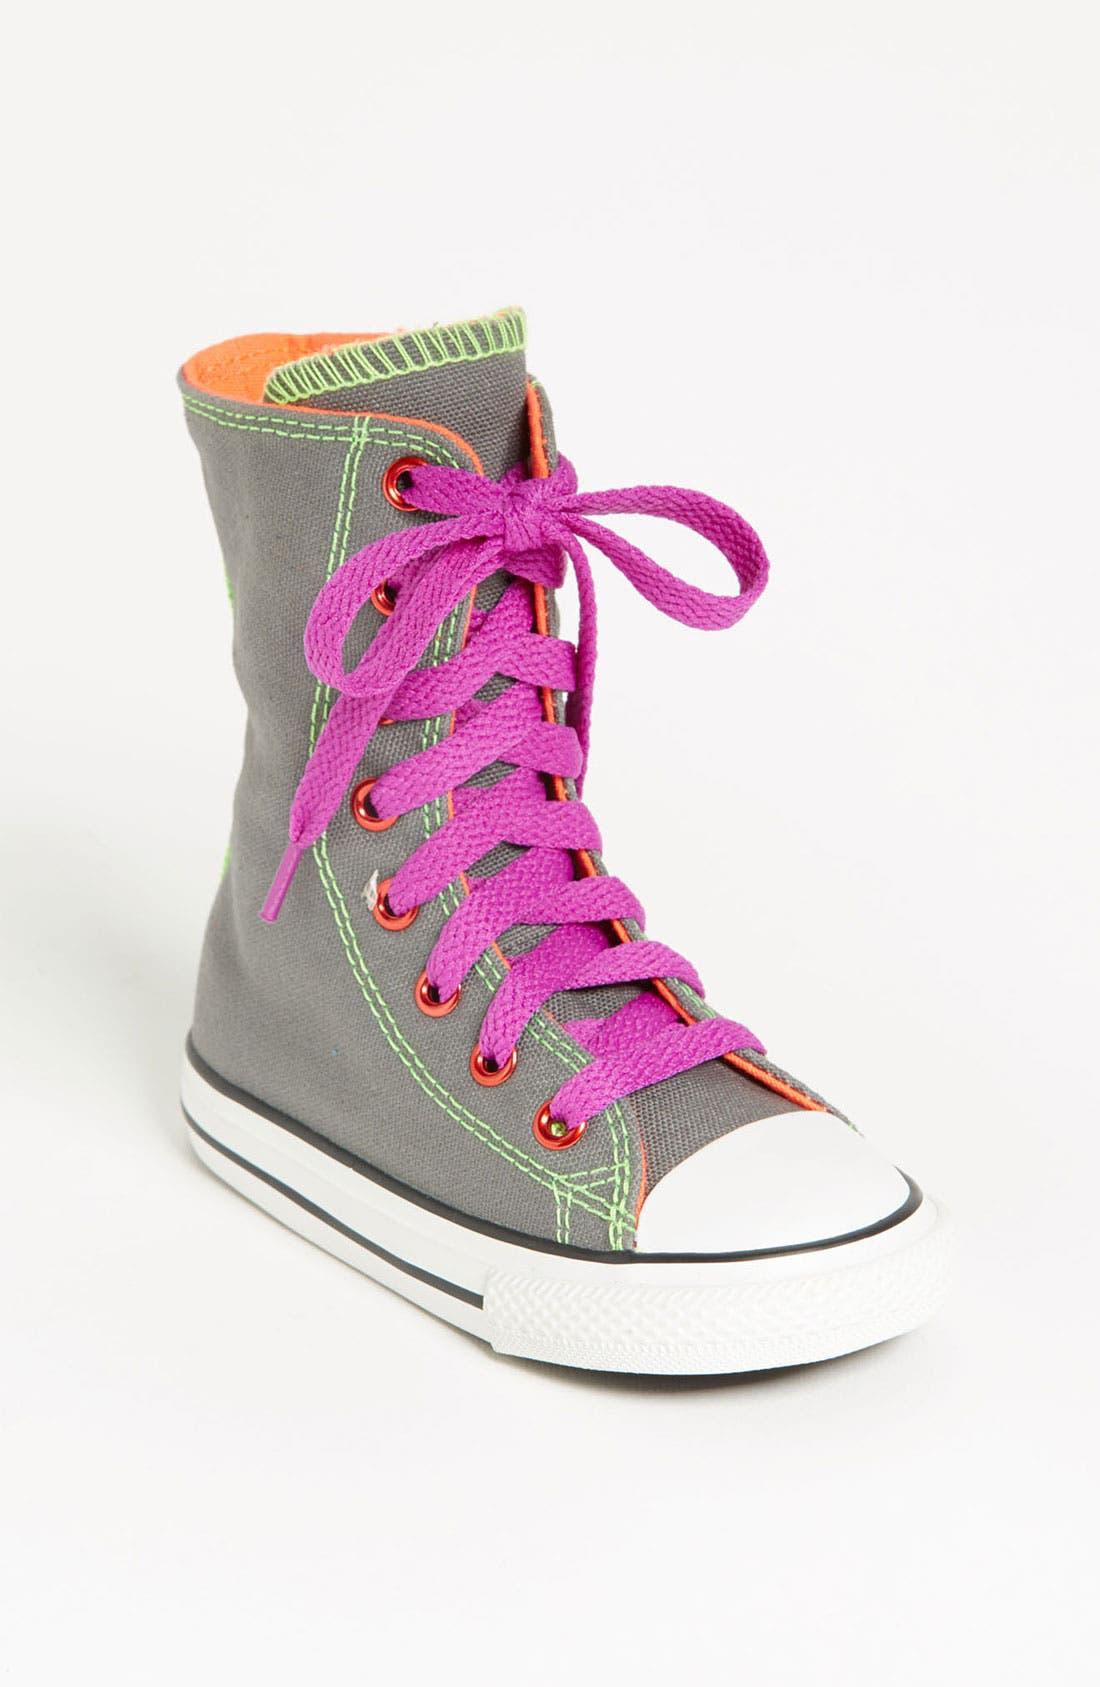 Alternate Image 1 Selected - Converse Chuck Taylor® All Star® 'Neon X-HI' Sneaker (Walker & Toddler)